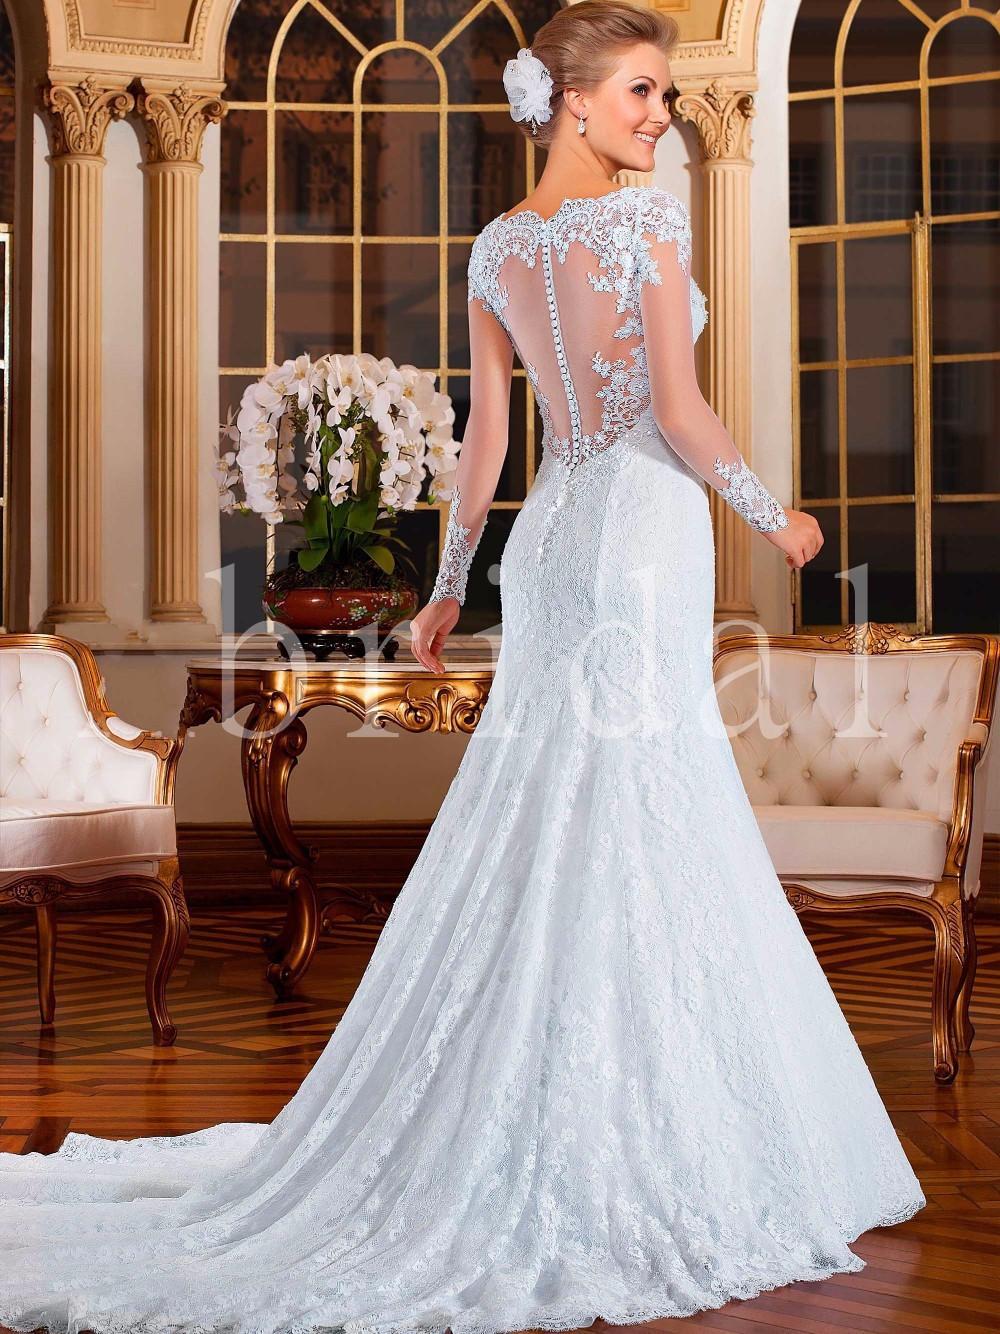 Mermaid wedding dresses with lace sleeves